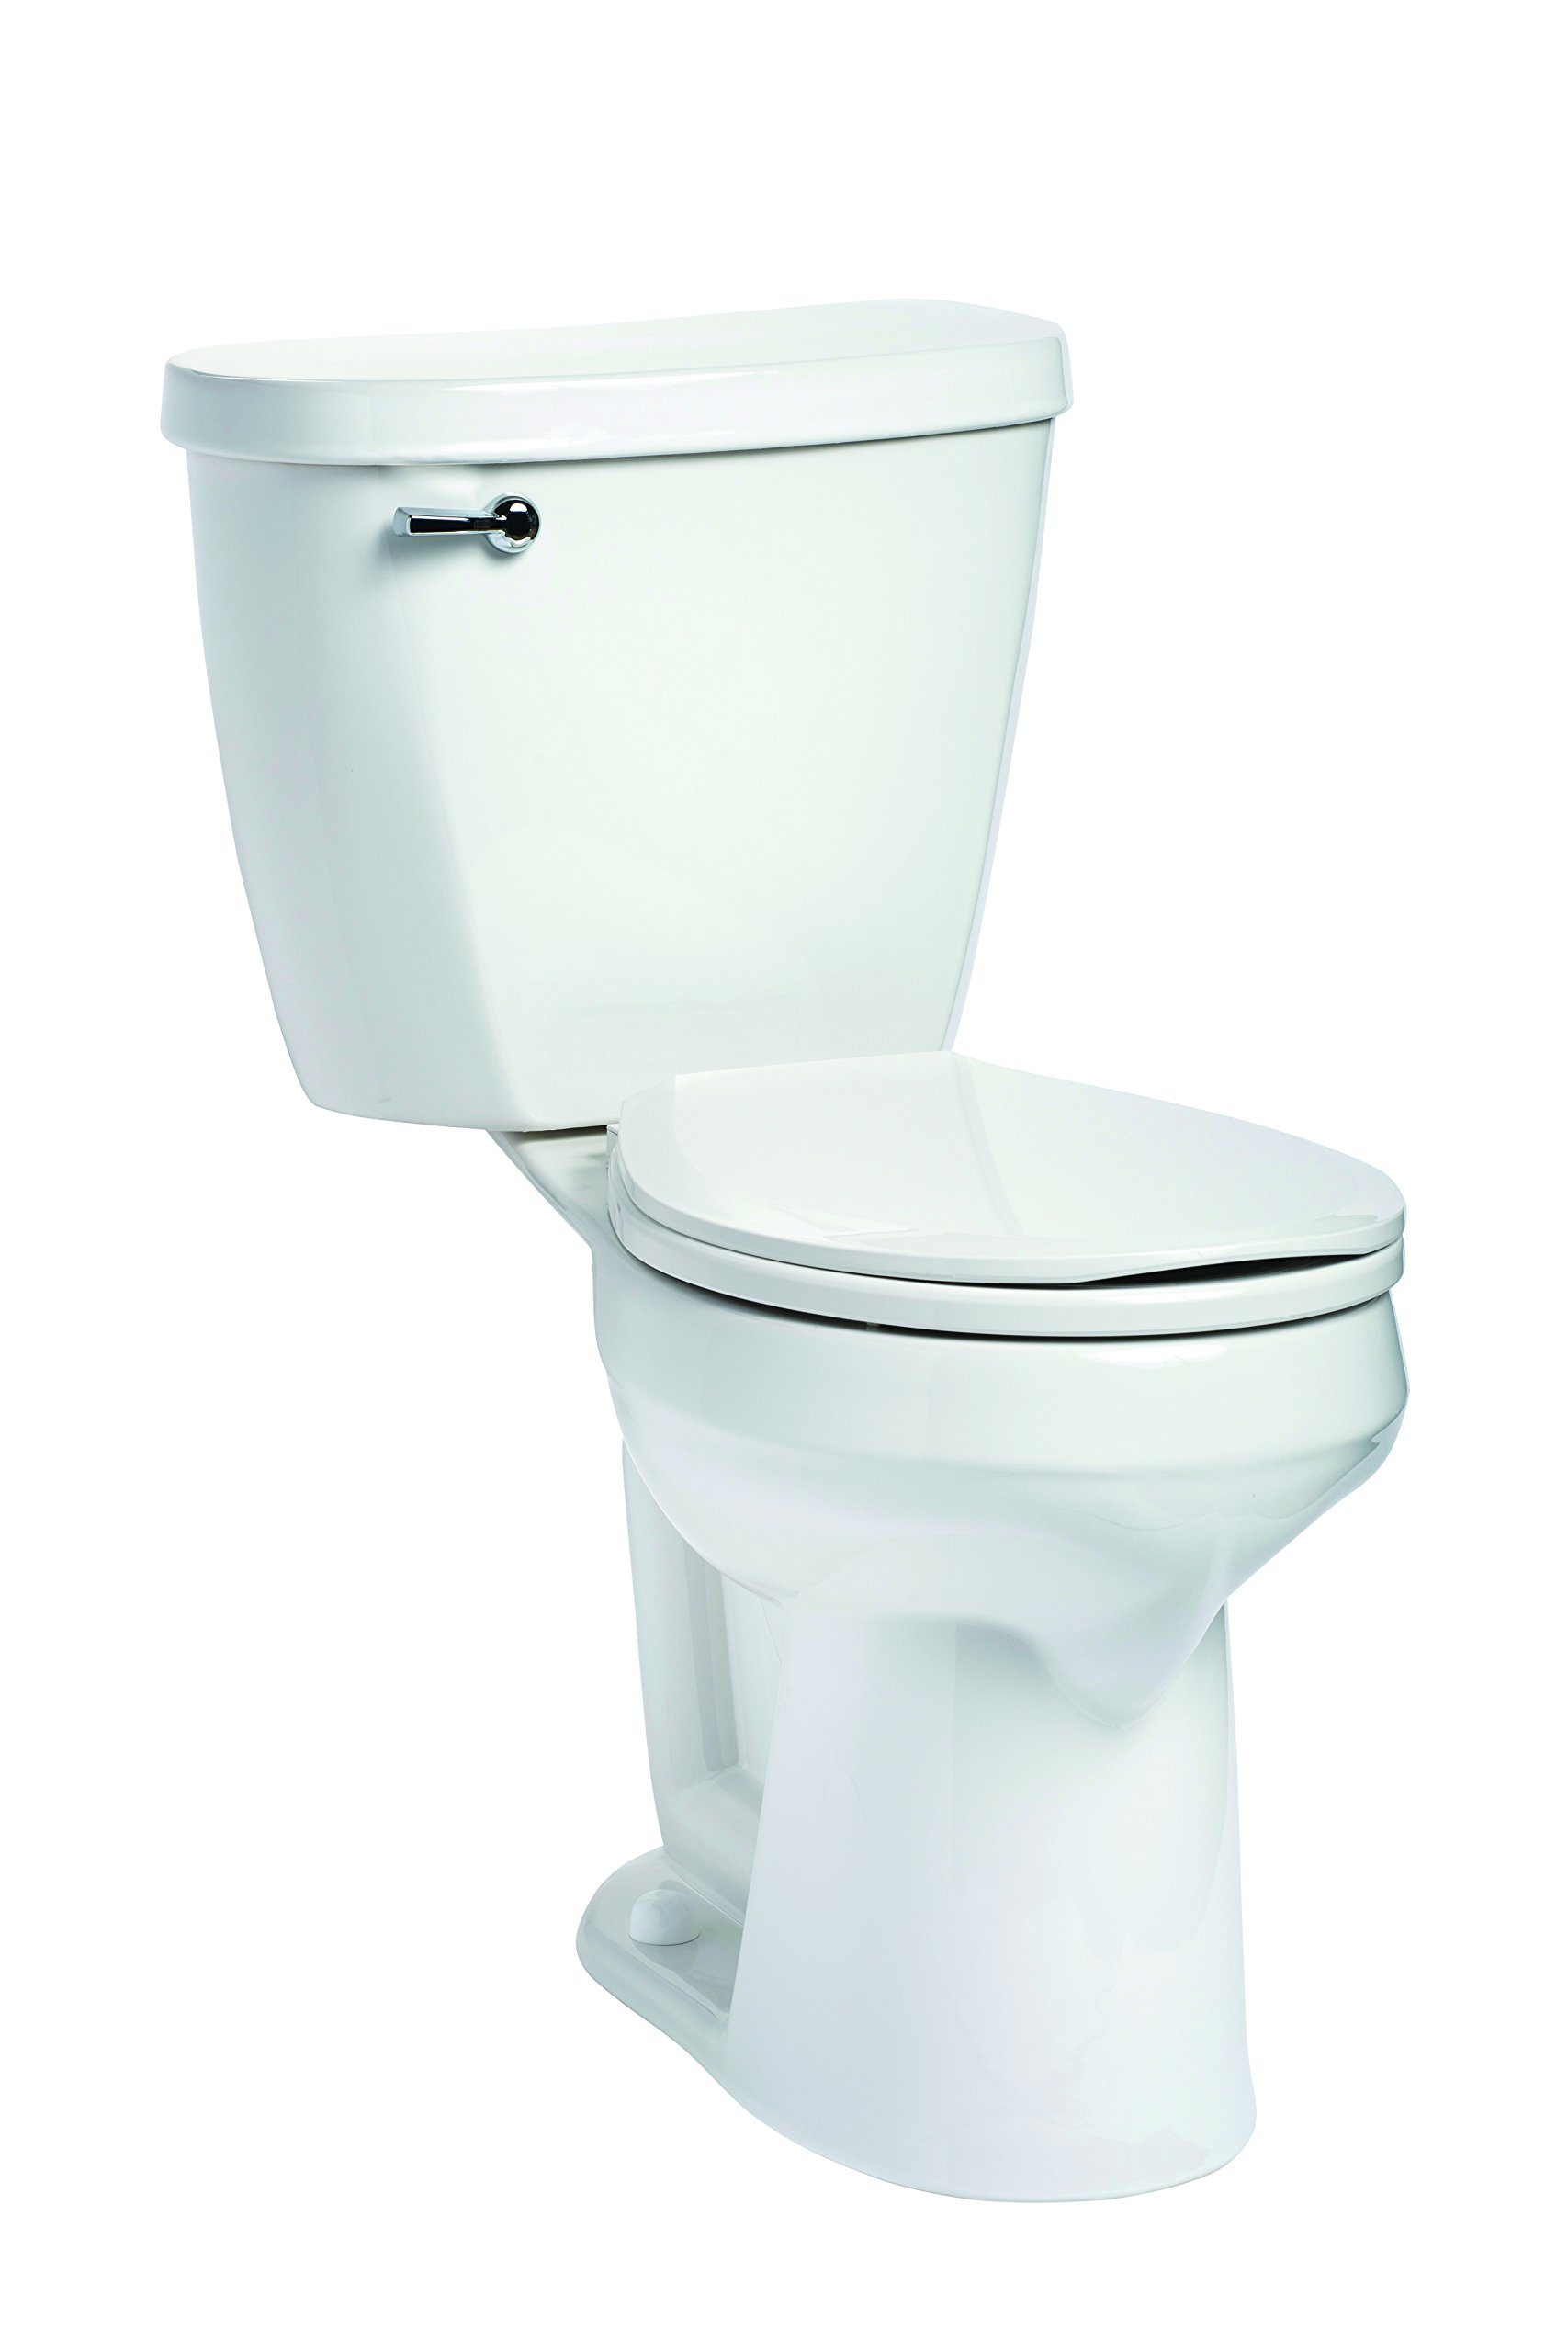 Mansfield Plumbing 388.386.WHT Summit Round SmartHeight Toilet, White by Mansfield Plumbing